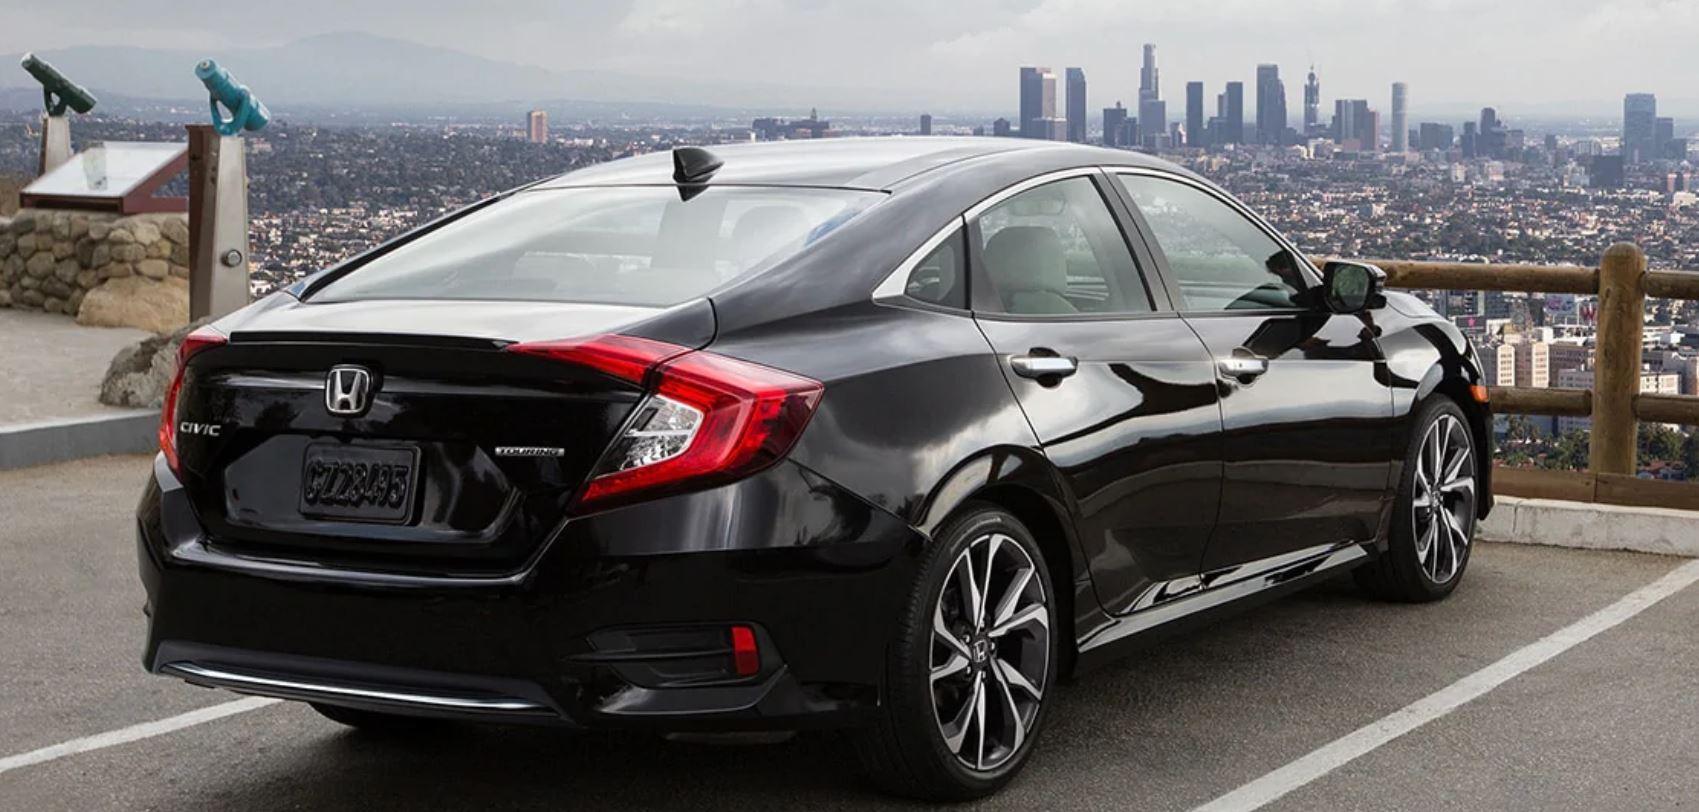 2020 Honda Civic Leasing near Bowie, MD